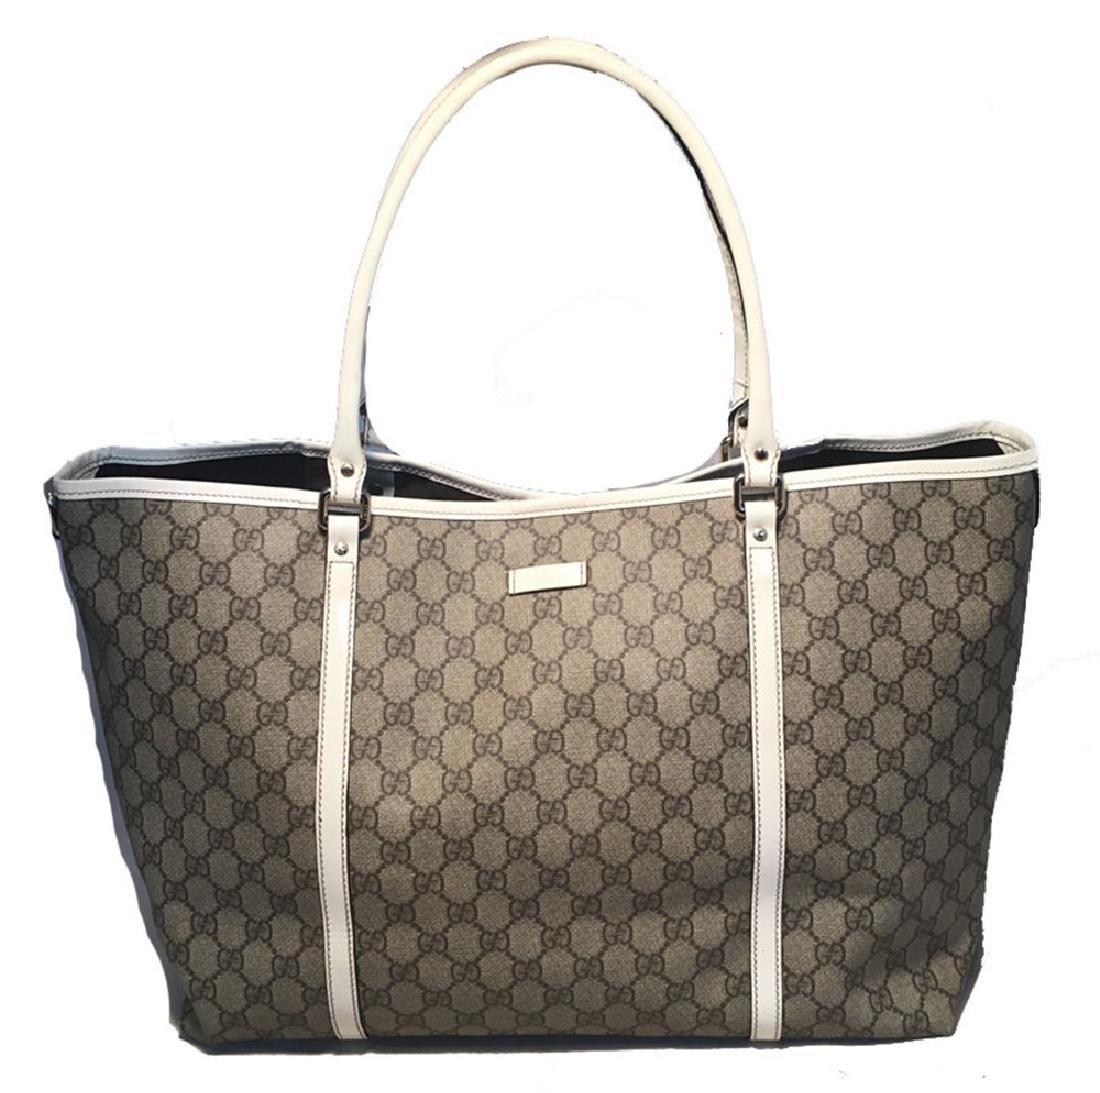 Gucci Monogram White Patent Leather Joy Tote GM